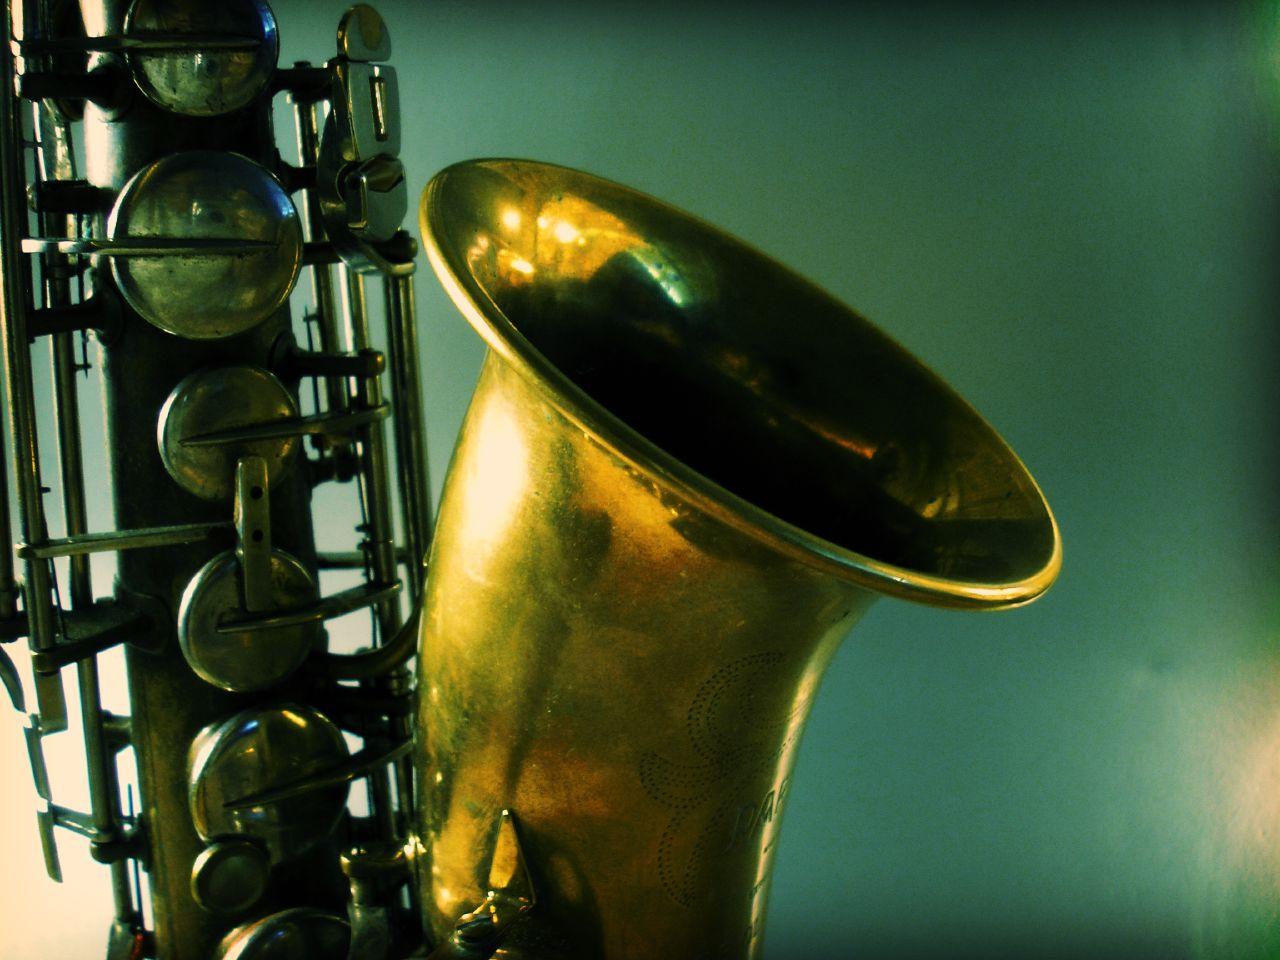 Photo: saxophone